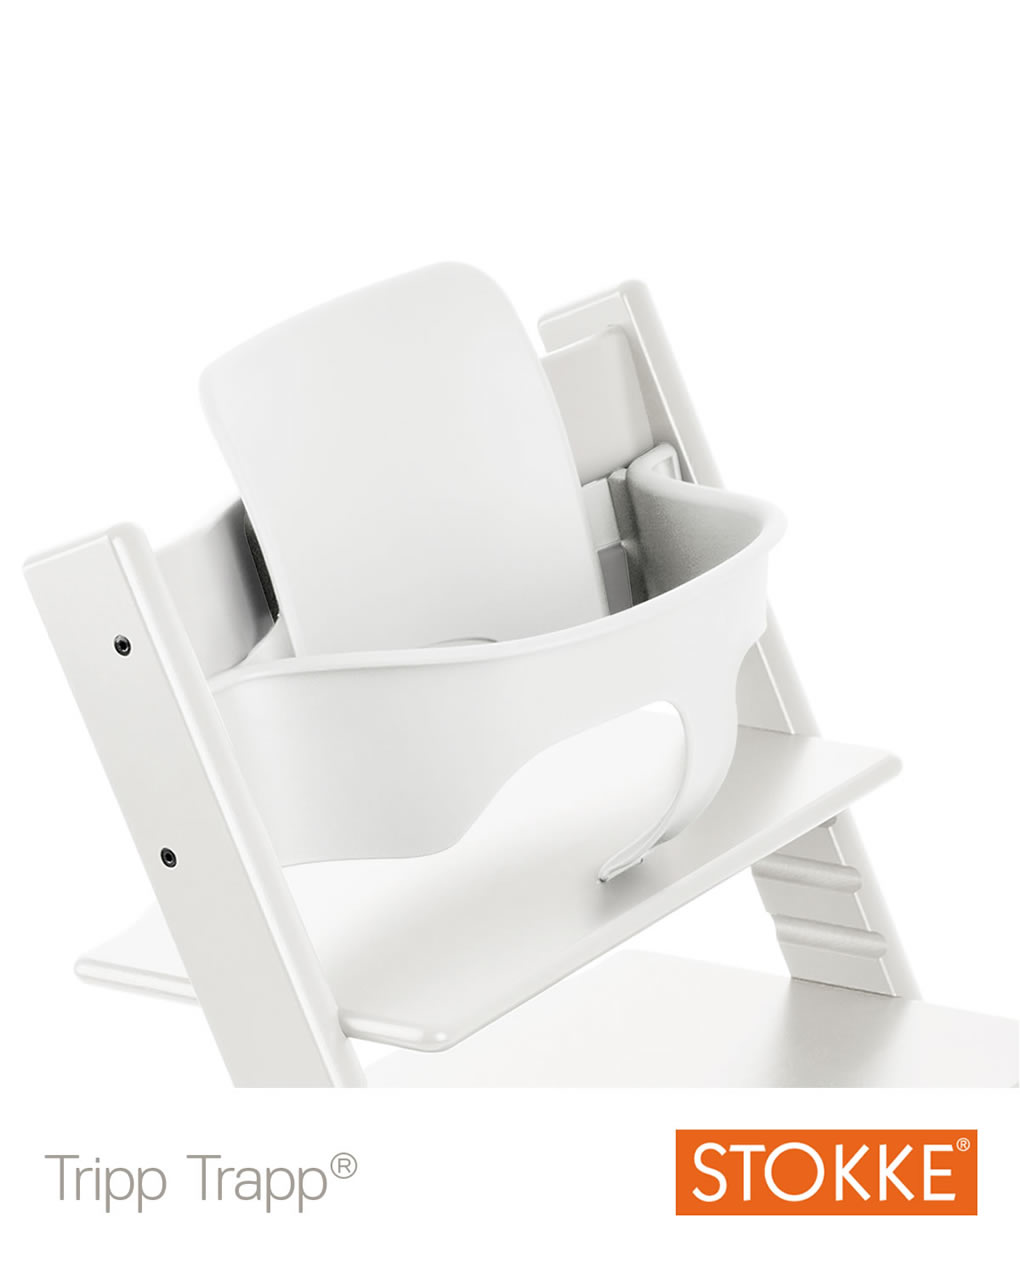 Stokke® baby set per tripp trapp® - bianco - Stokke